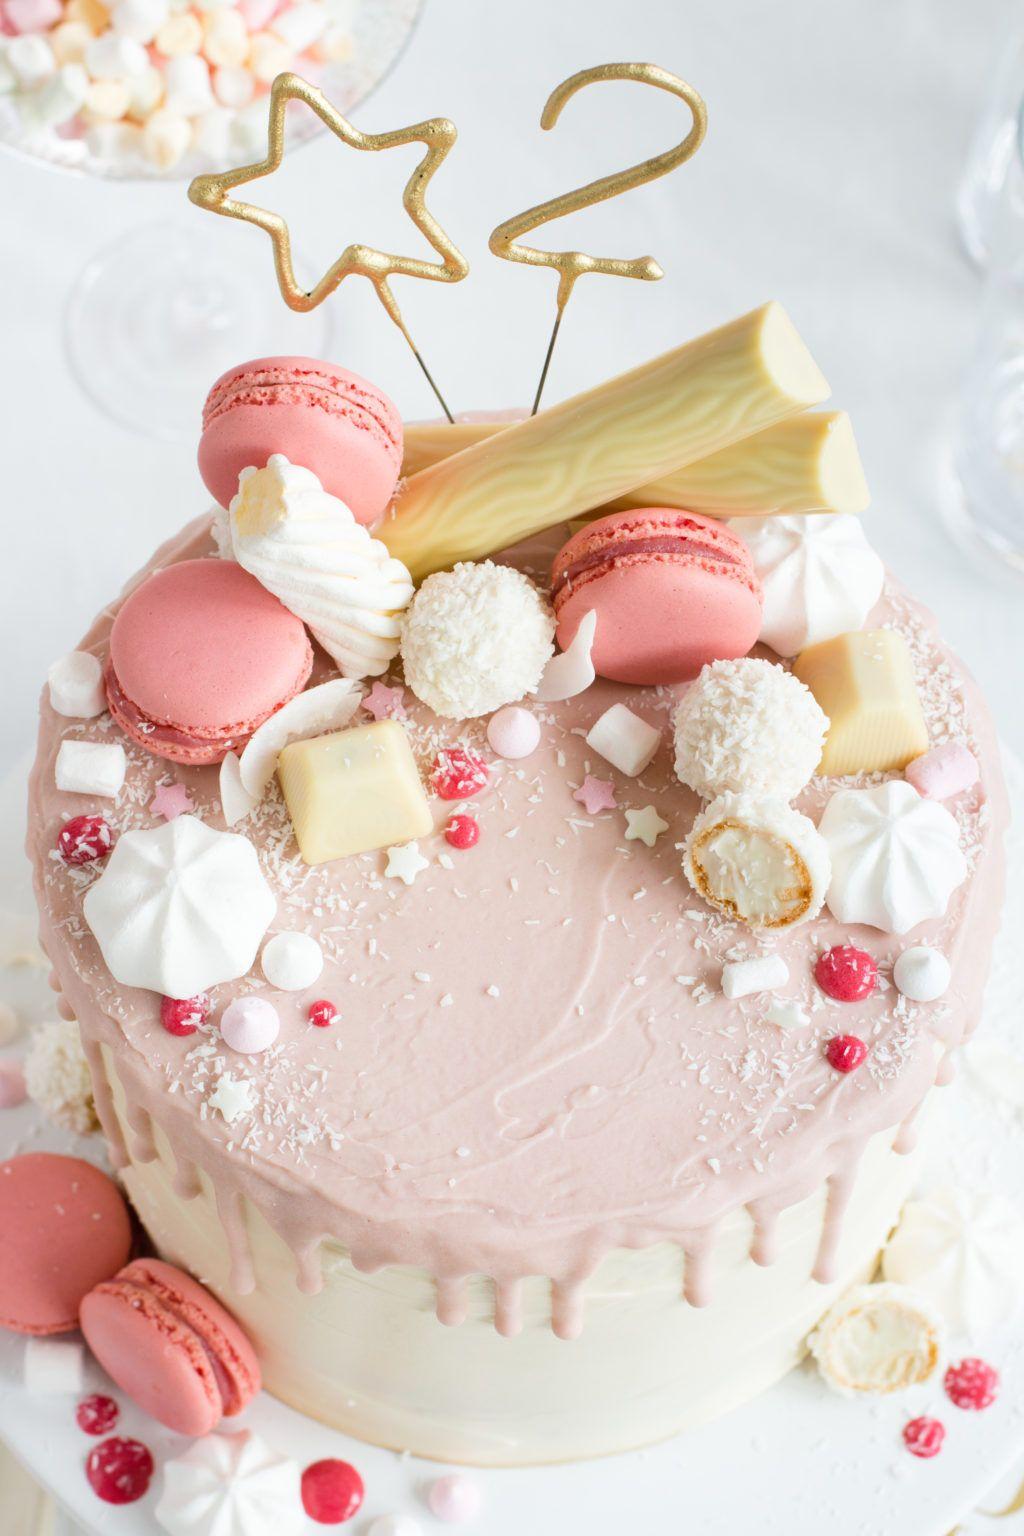 Candy Drip Cake – Geburtstagstorte mit Himbeer Curd #tortegeburtstag